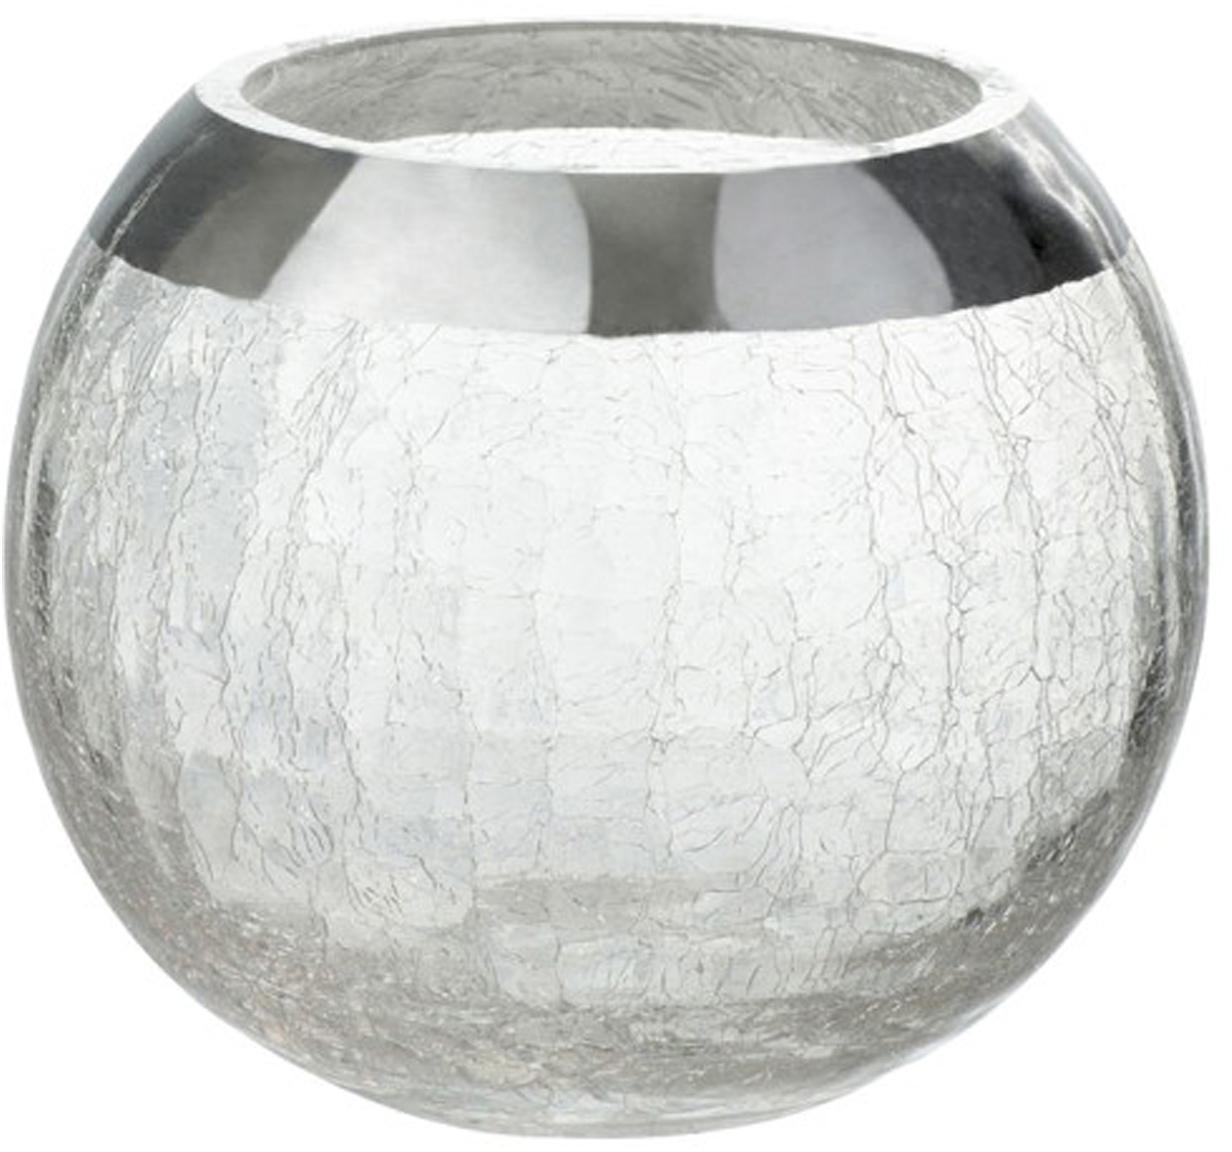 Waxinelichthouder Lackle, Gelakt glas, Transparant, zilverkleurig, Ø 14 x H 11 cm